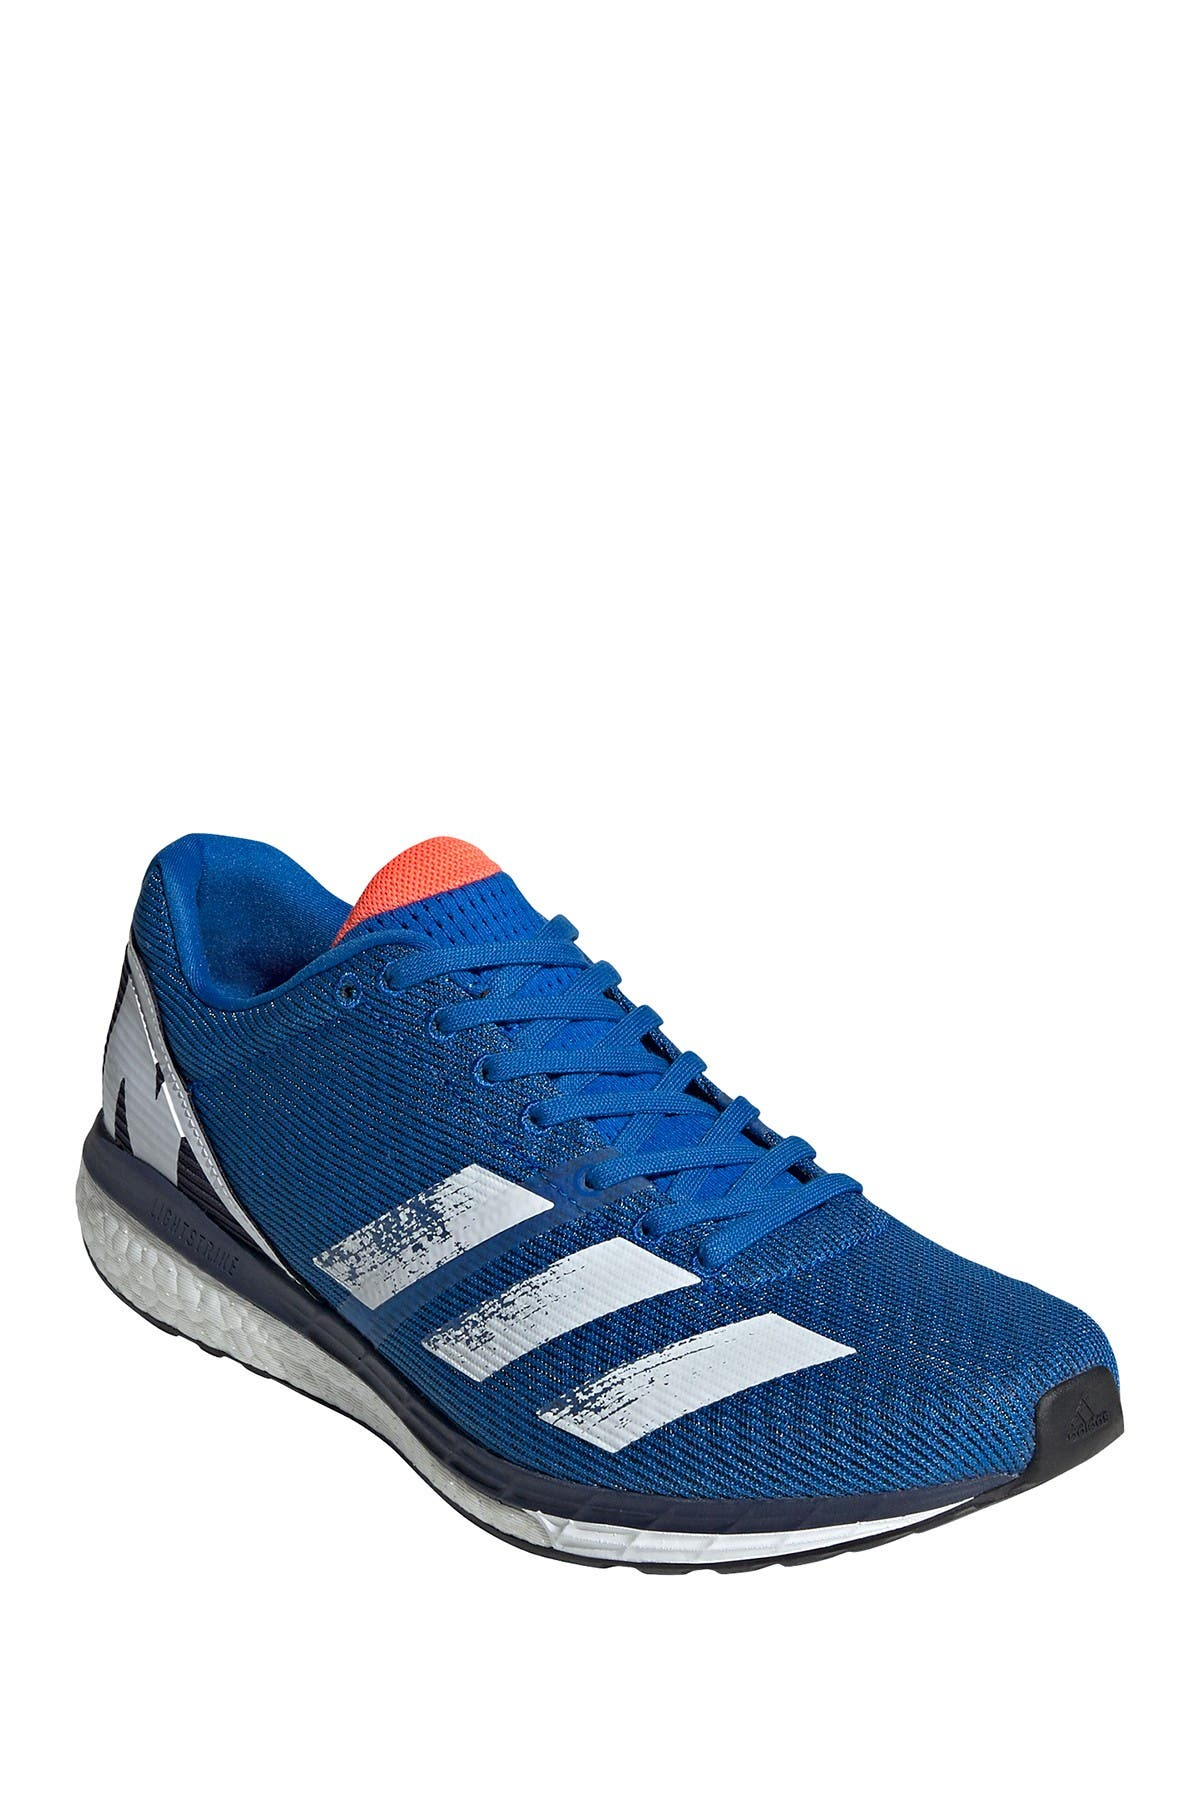 Image of adidas Adizero Boston 8 Running Shoe